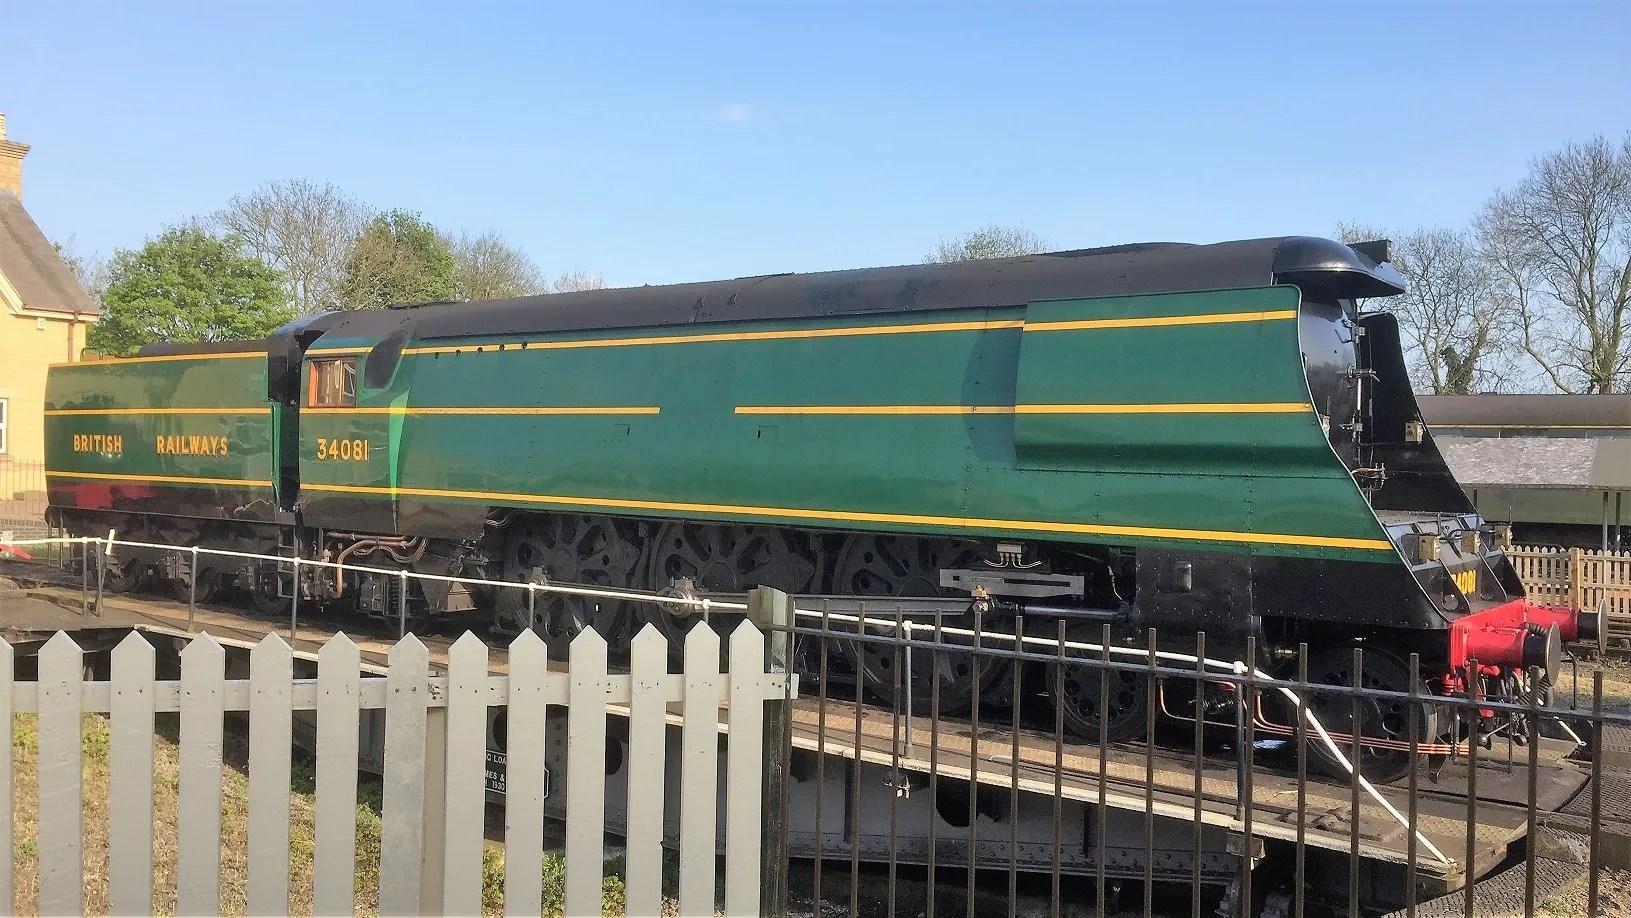 Steam train trip on locomotive 34081 - 92 Squadron - battle of britain locomotive - Wansford - Nene Valley Railway